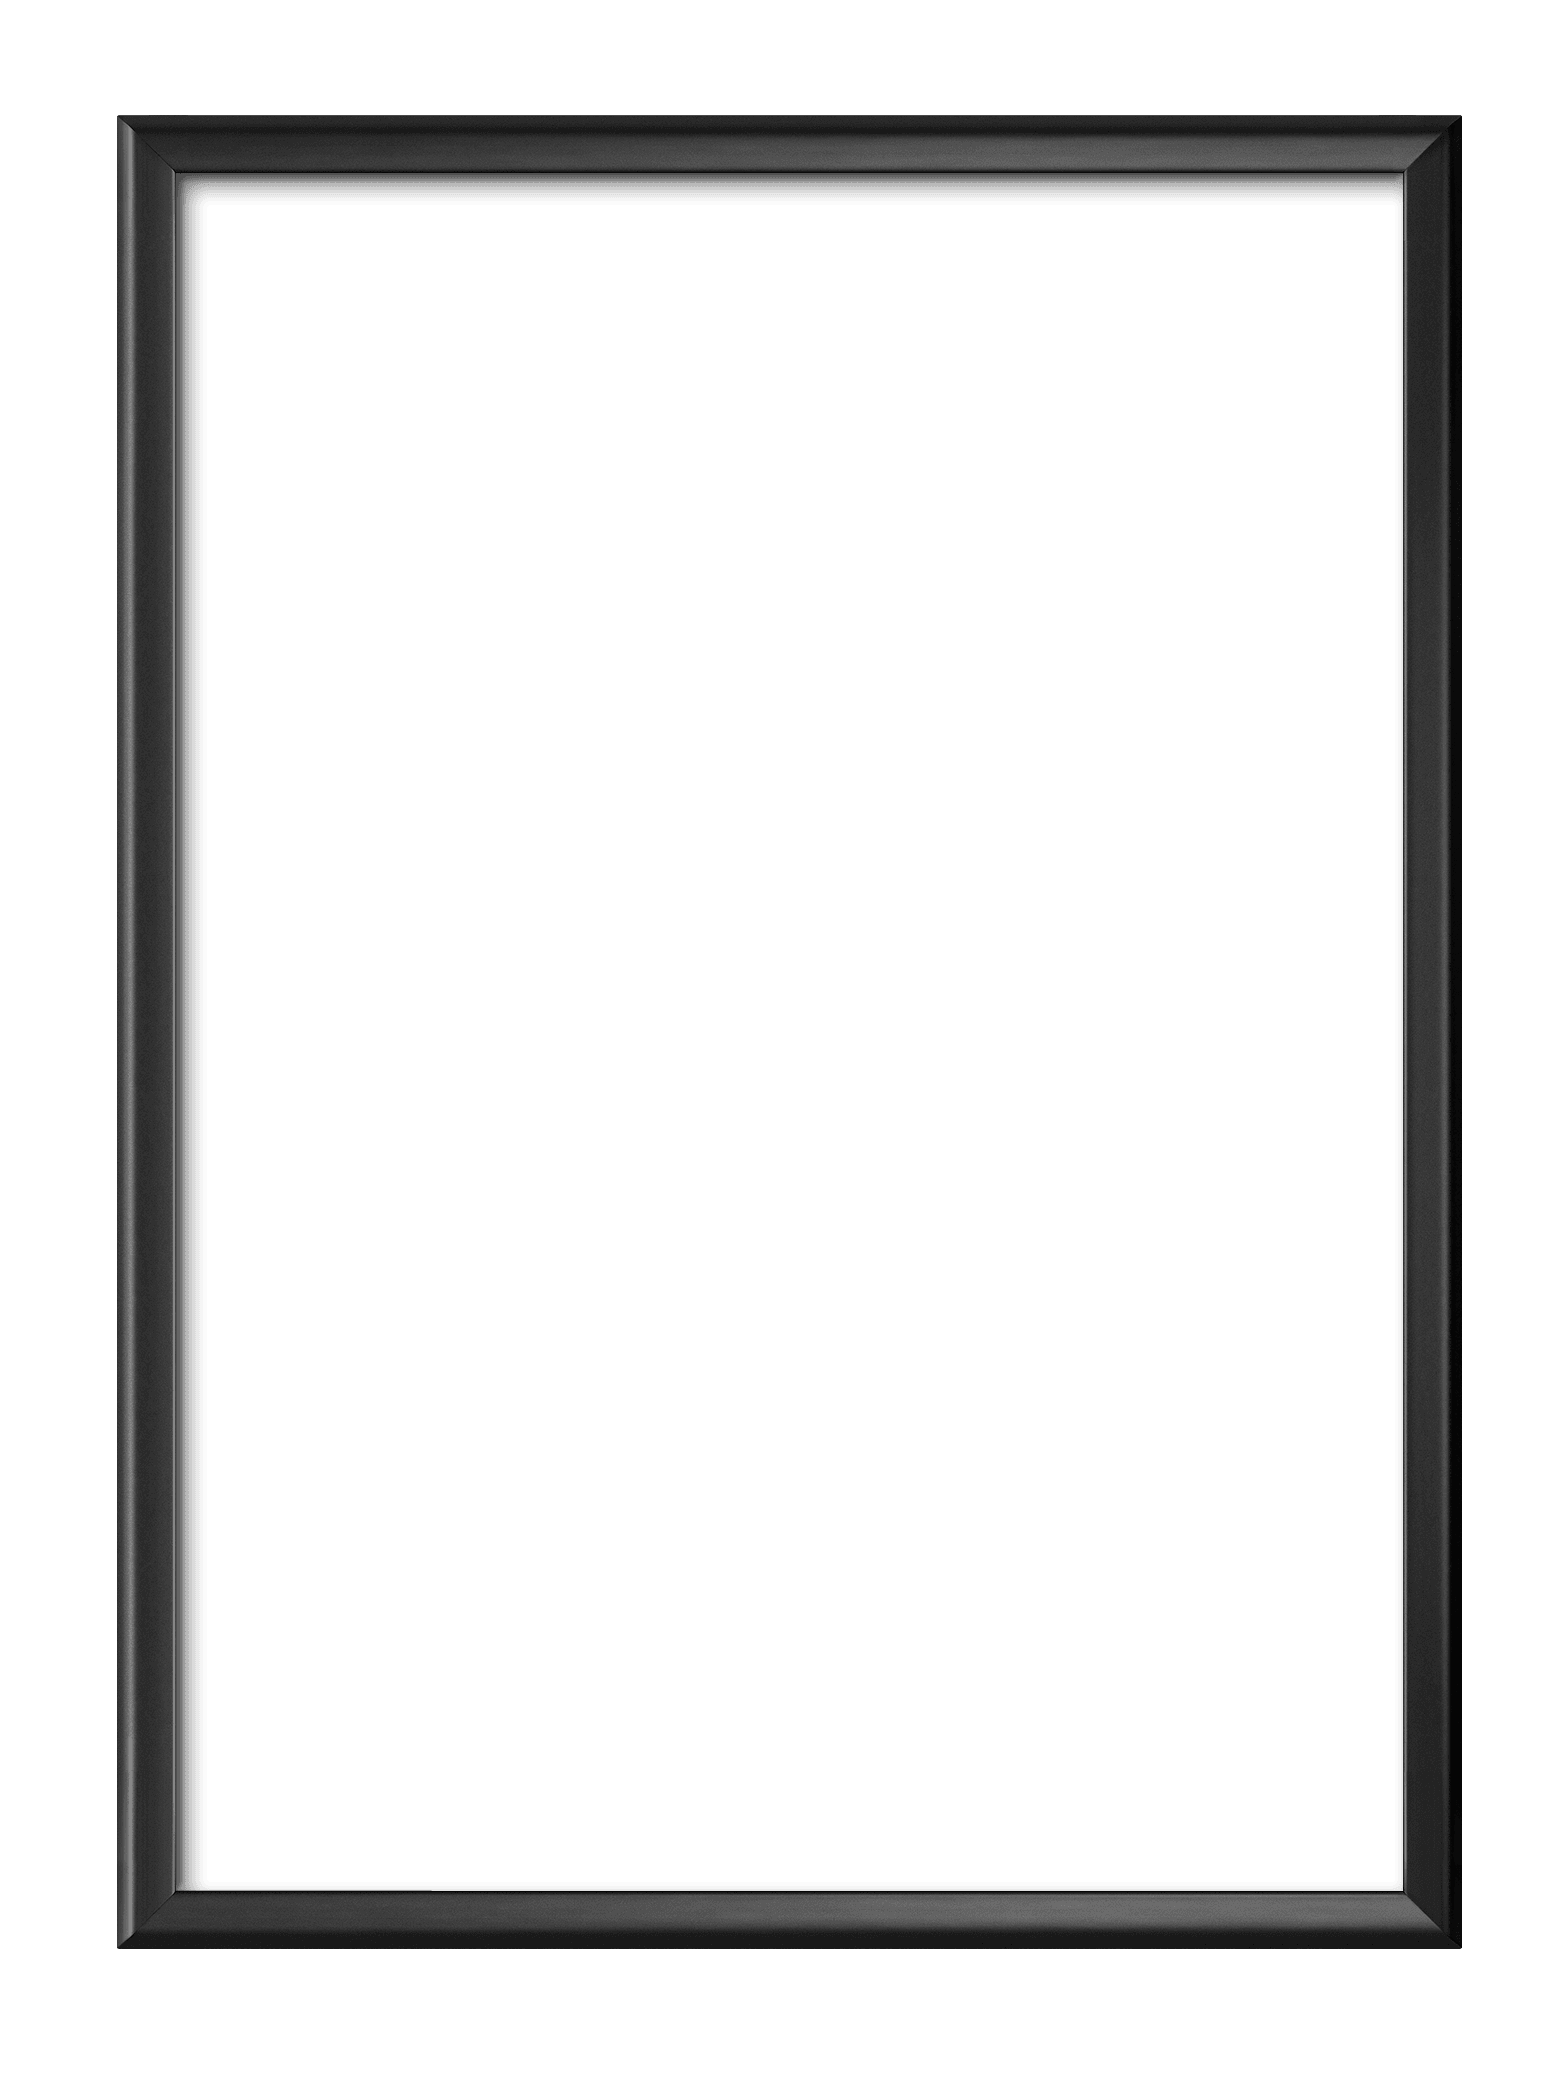 frame black png - Buscar con Google